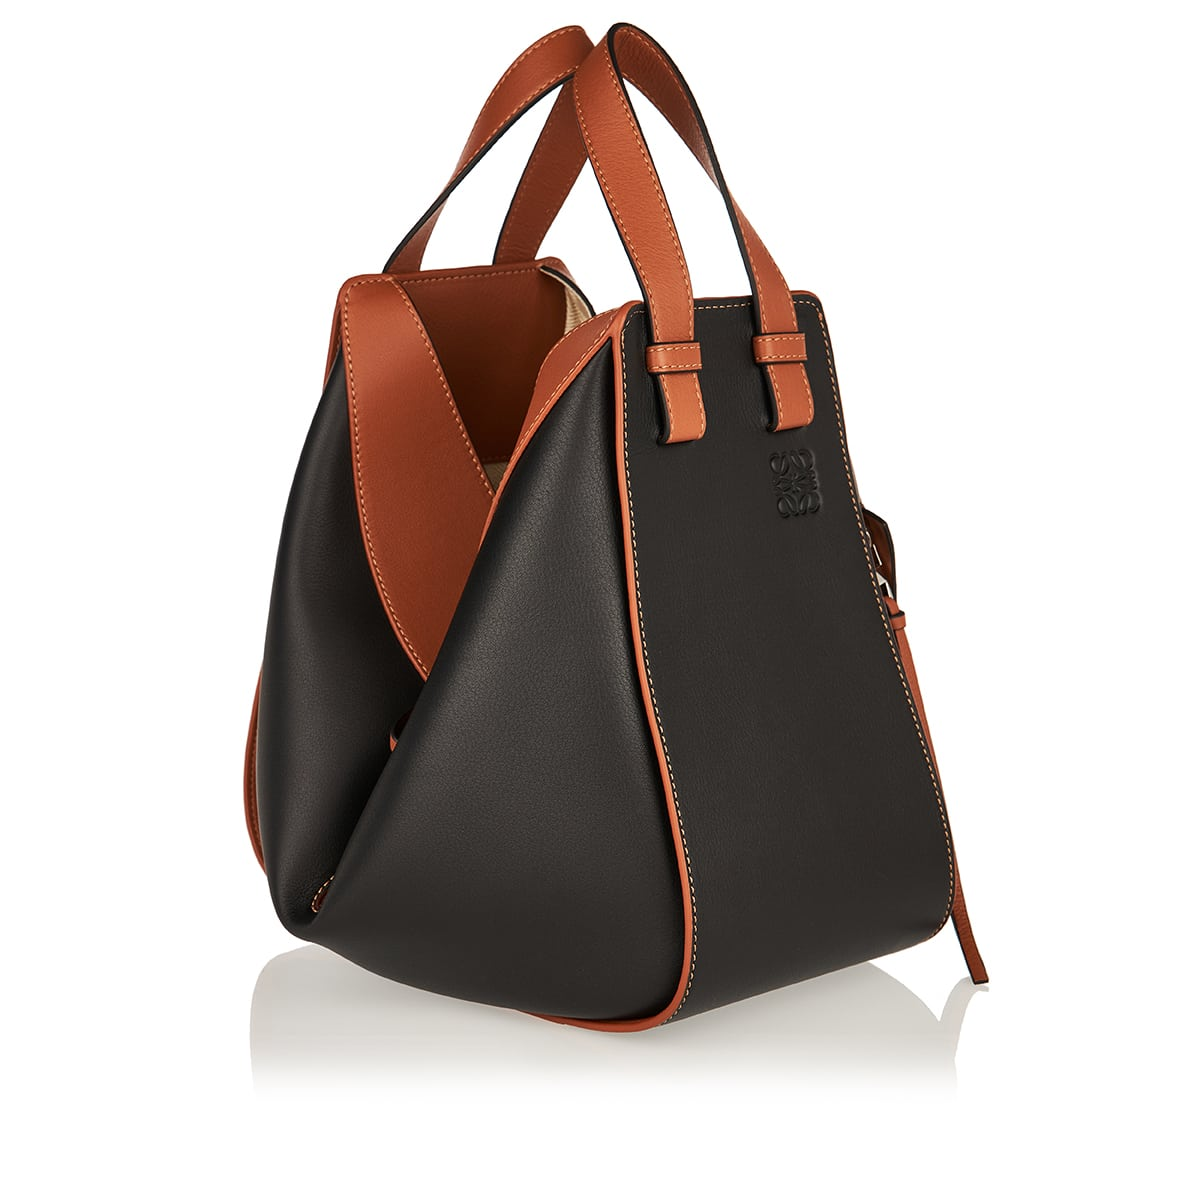 Small Hammock two-tone bag